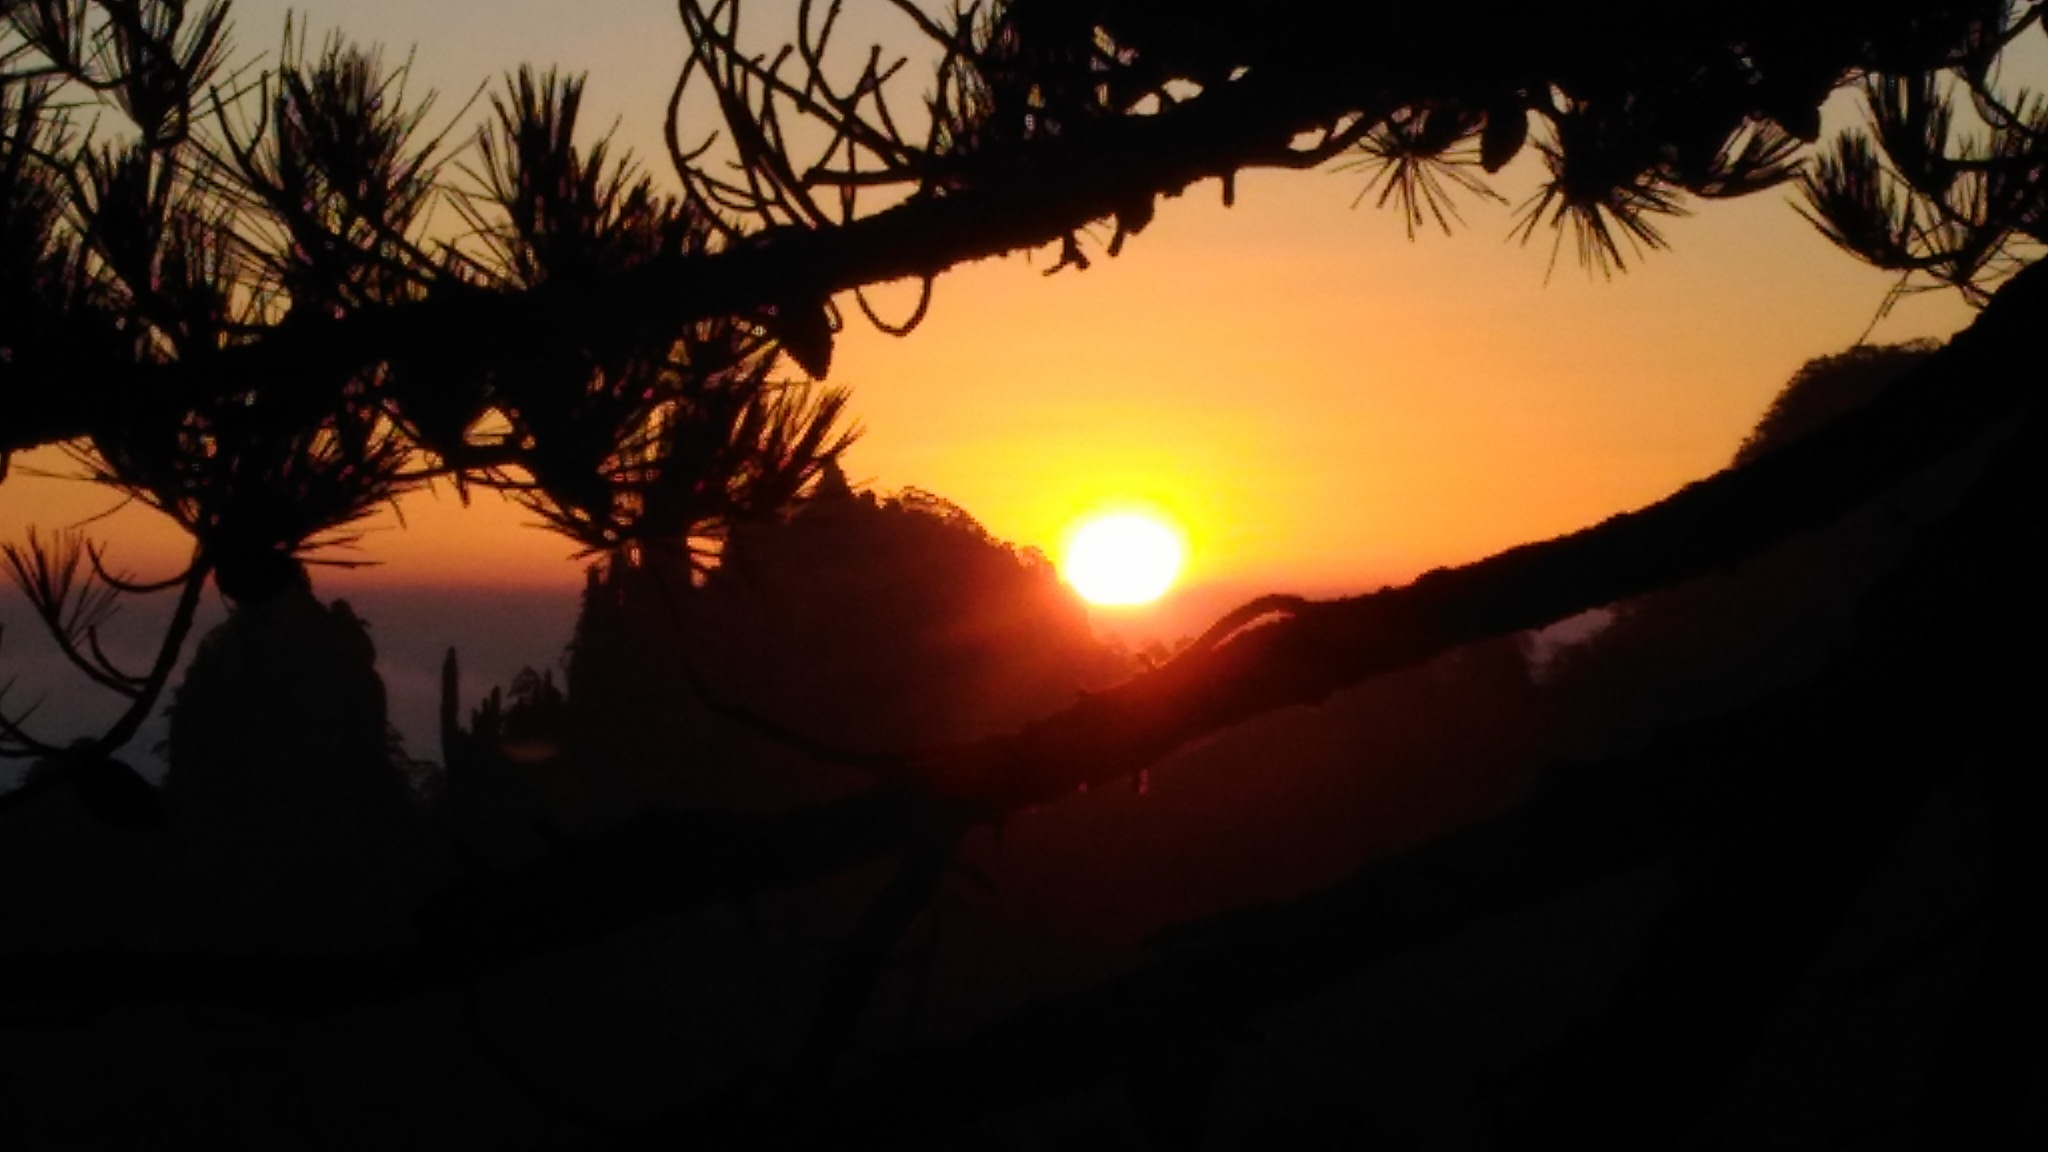 Sunrise by hugaman157